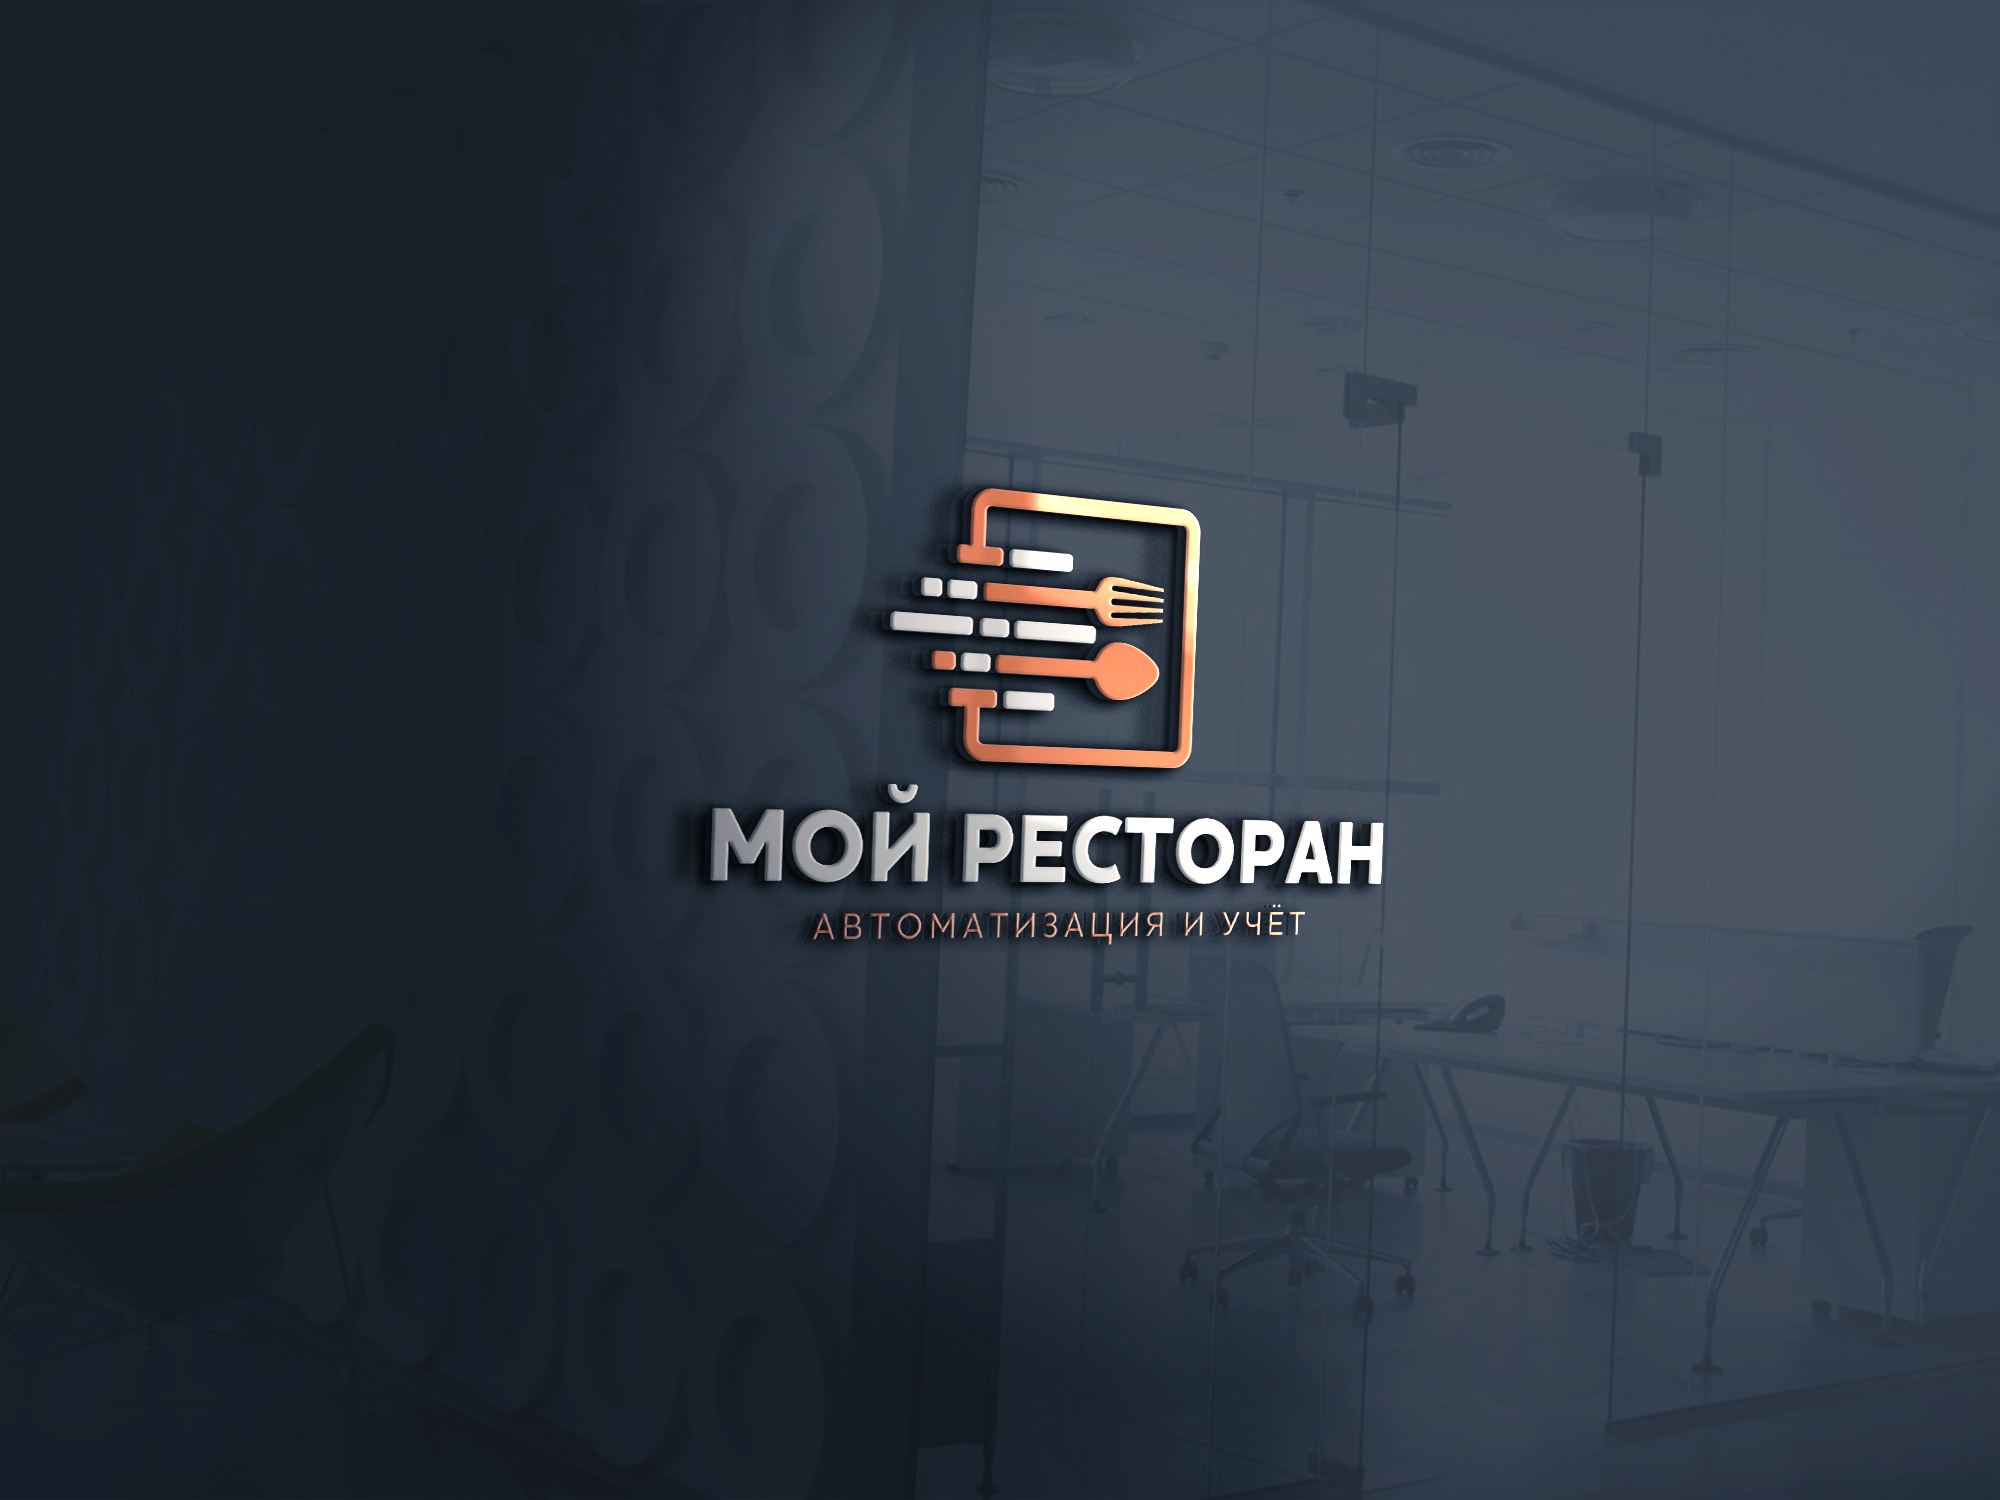 Разработать логотип и фавикон для IT- компании фото f_4765d5547829ee6e.jpg